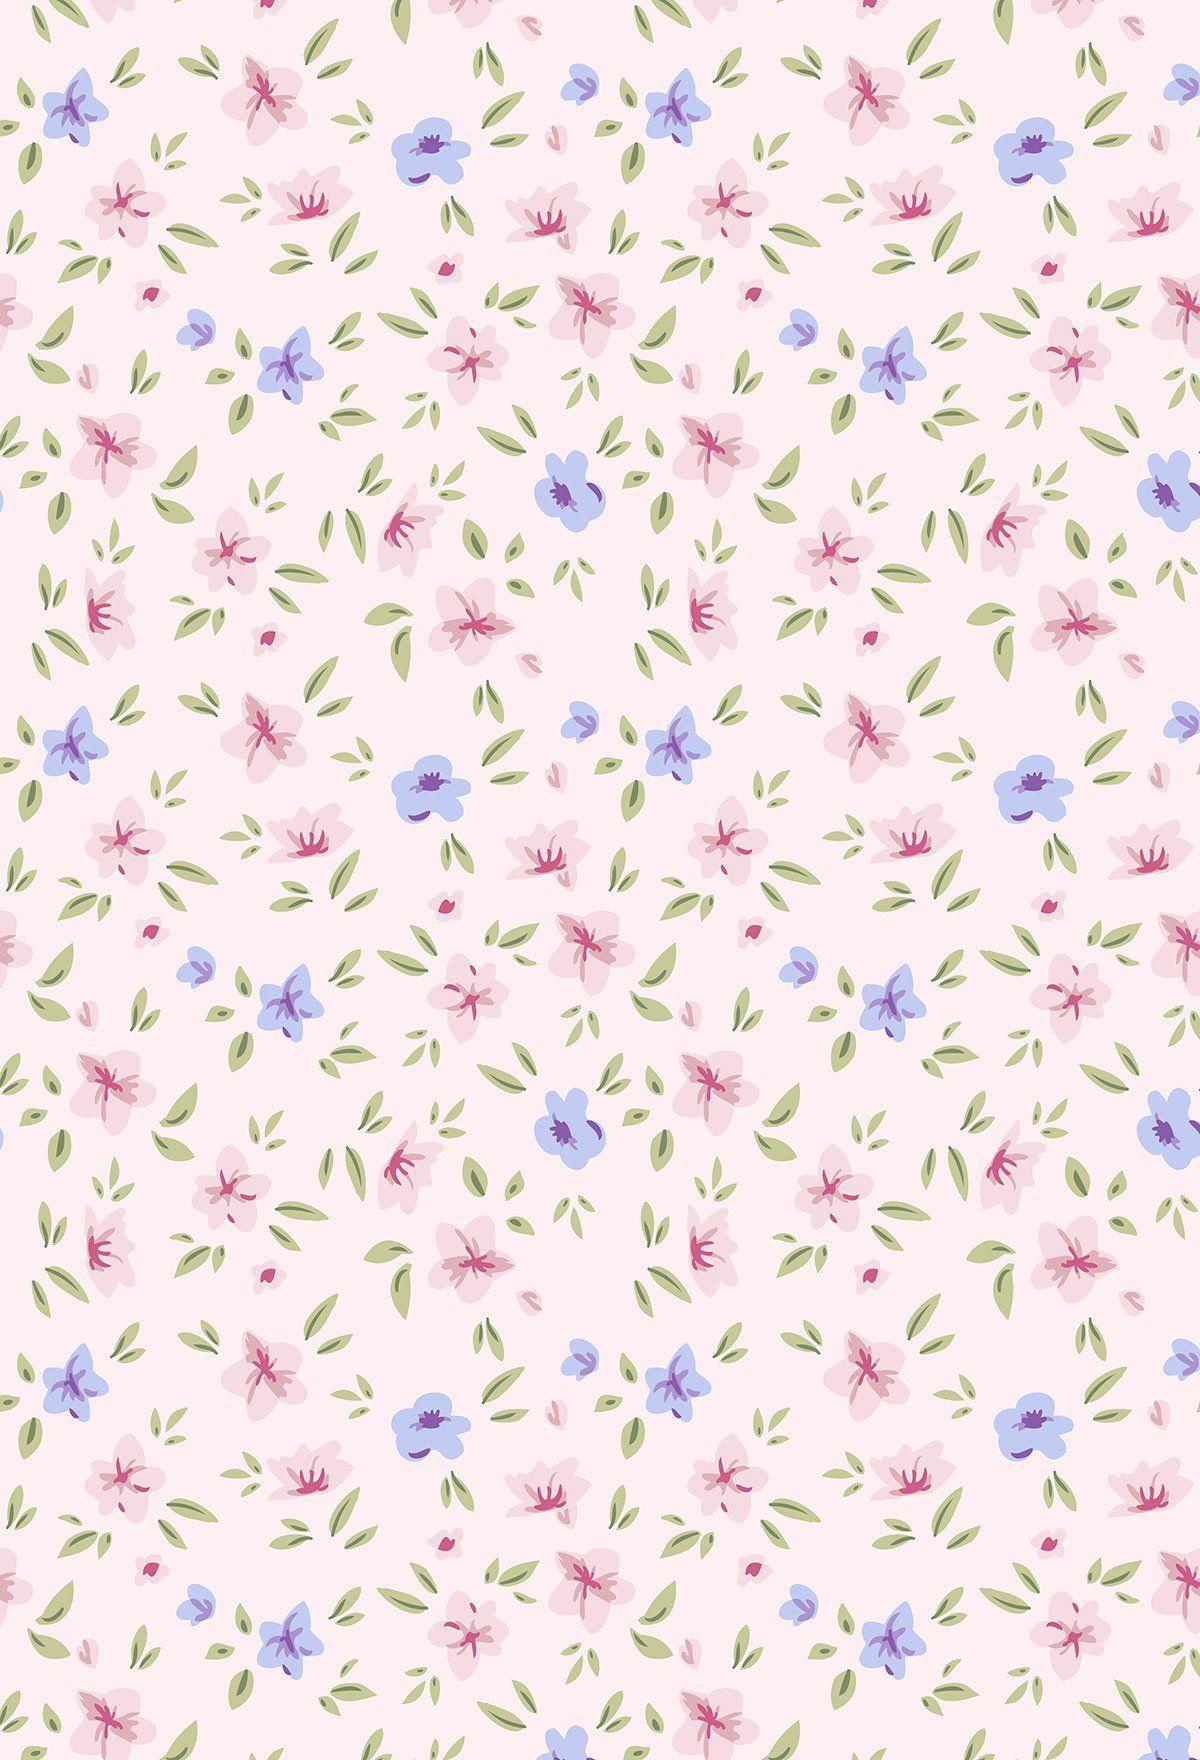 Blush Pink iPhone Wallpaper Bing images Carimbos de